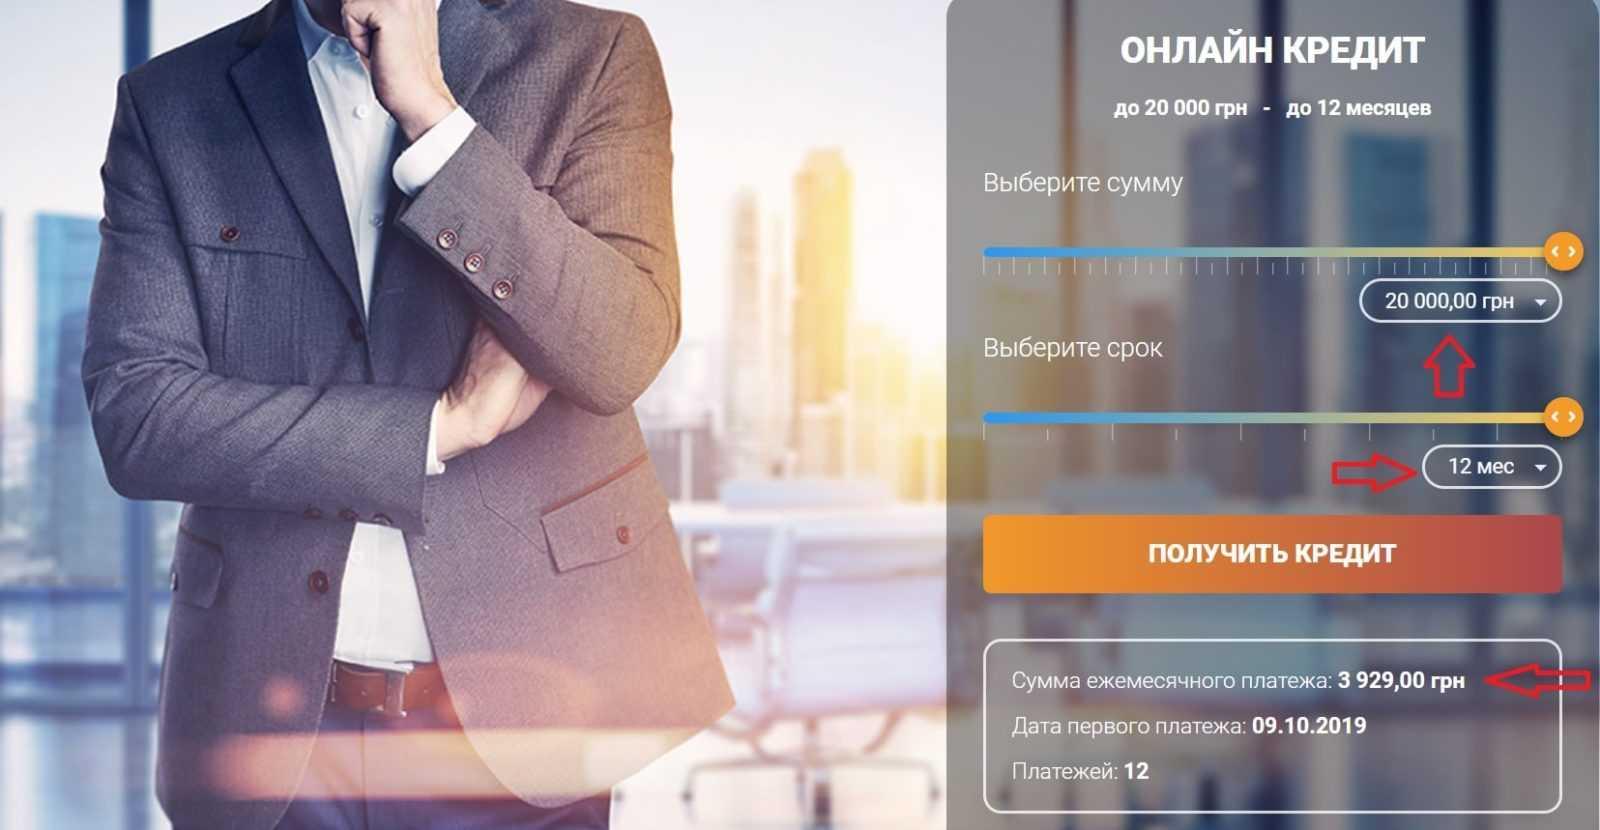 Онлайн кредит на карту с низким процентом можно ли в 15 лет взять кредит